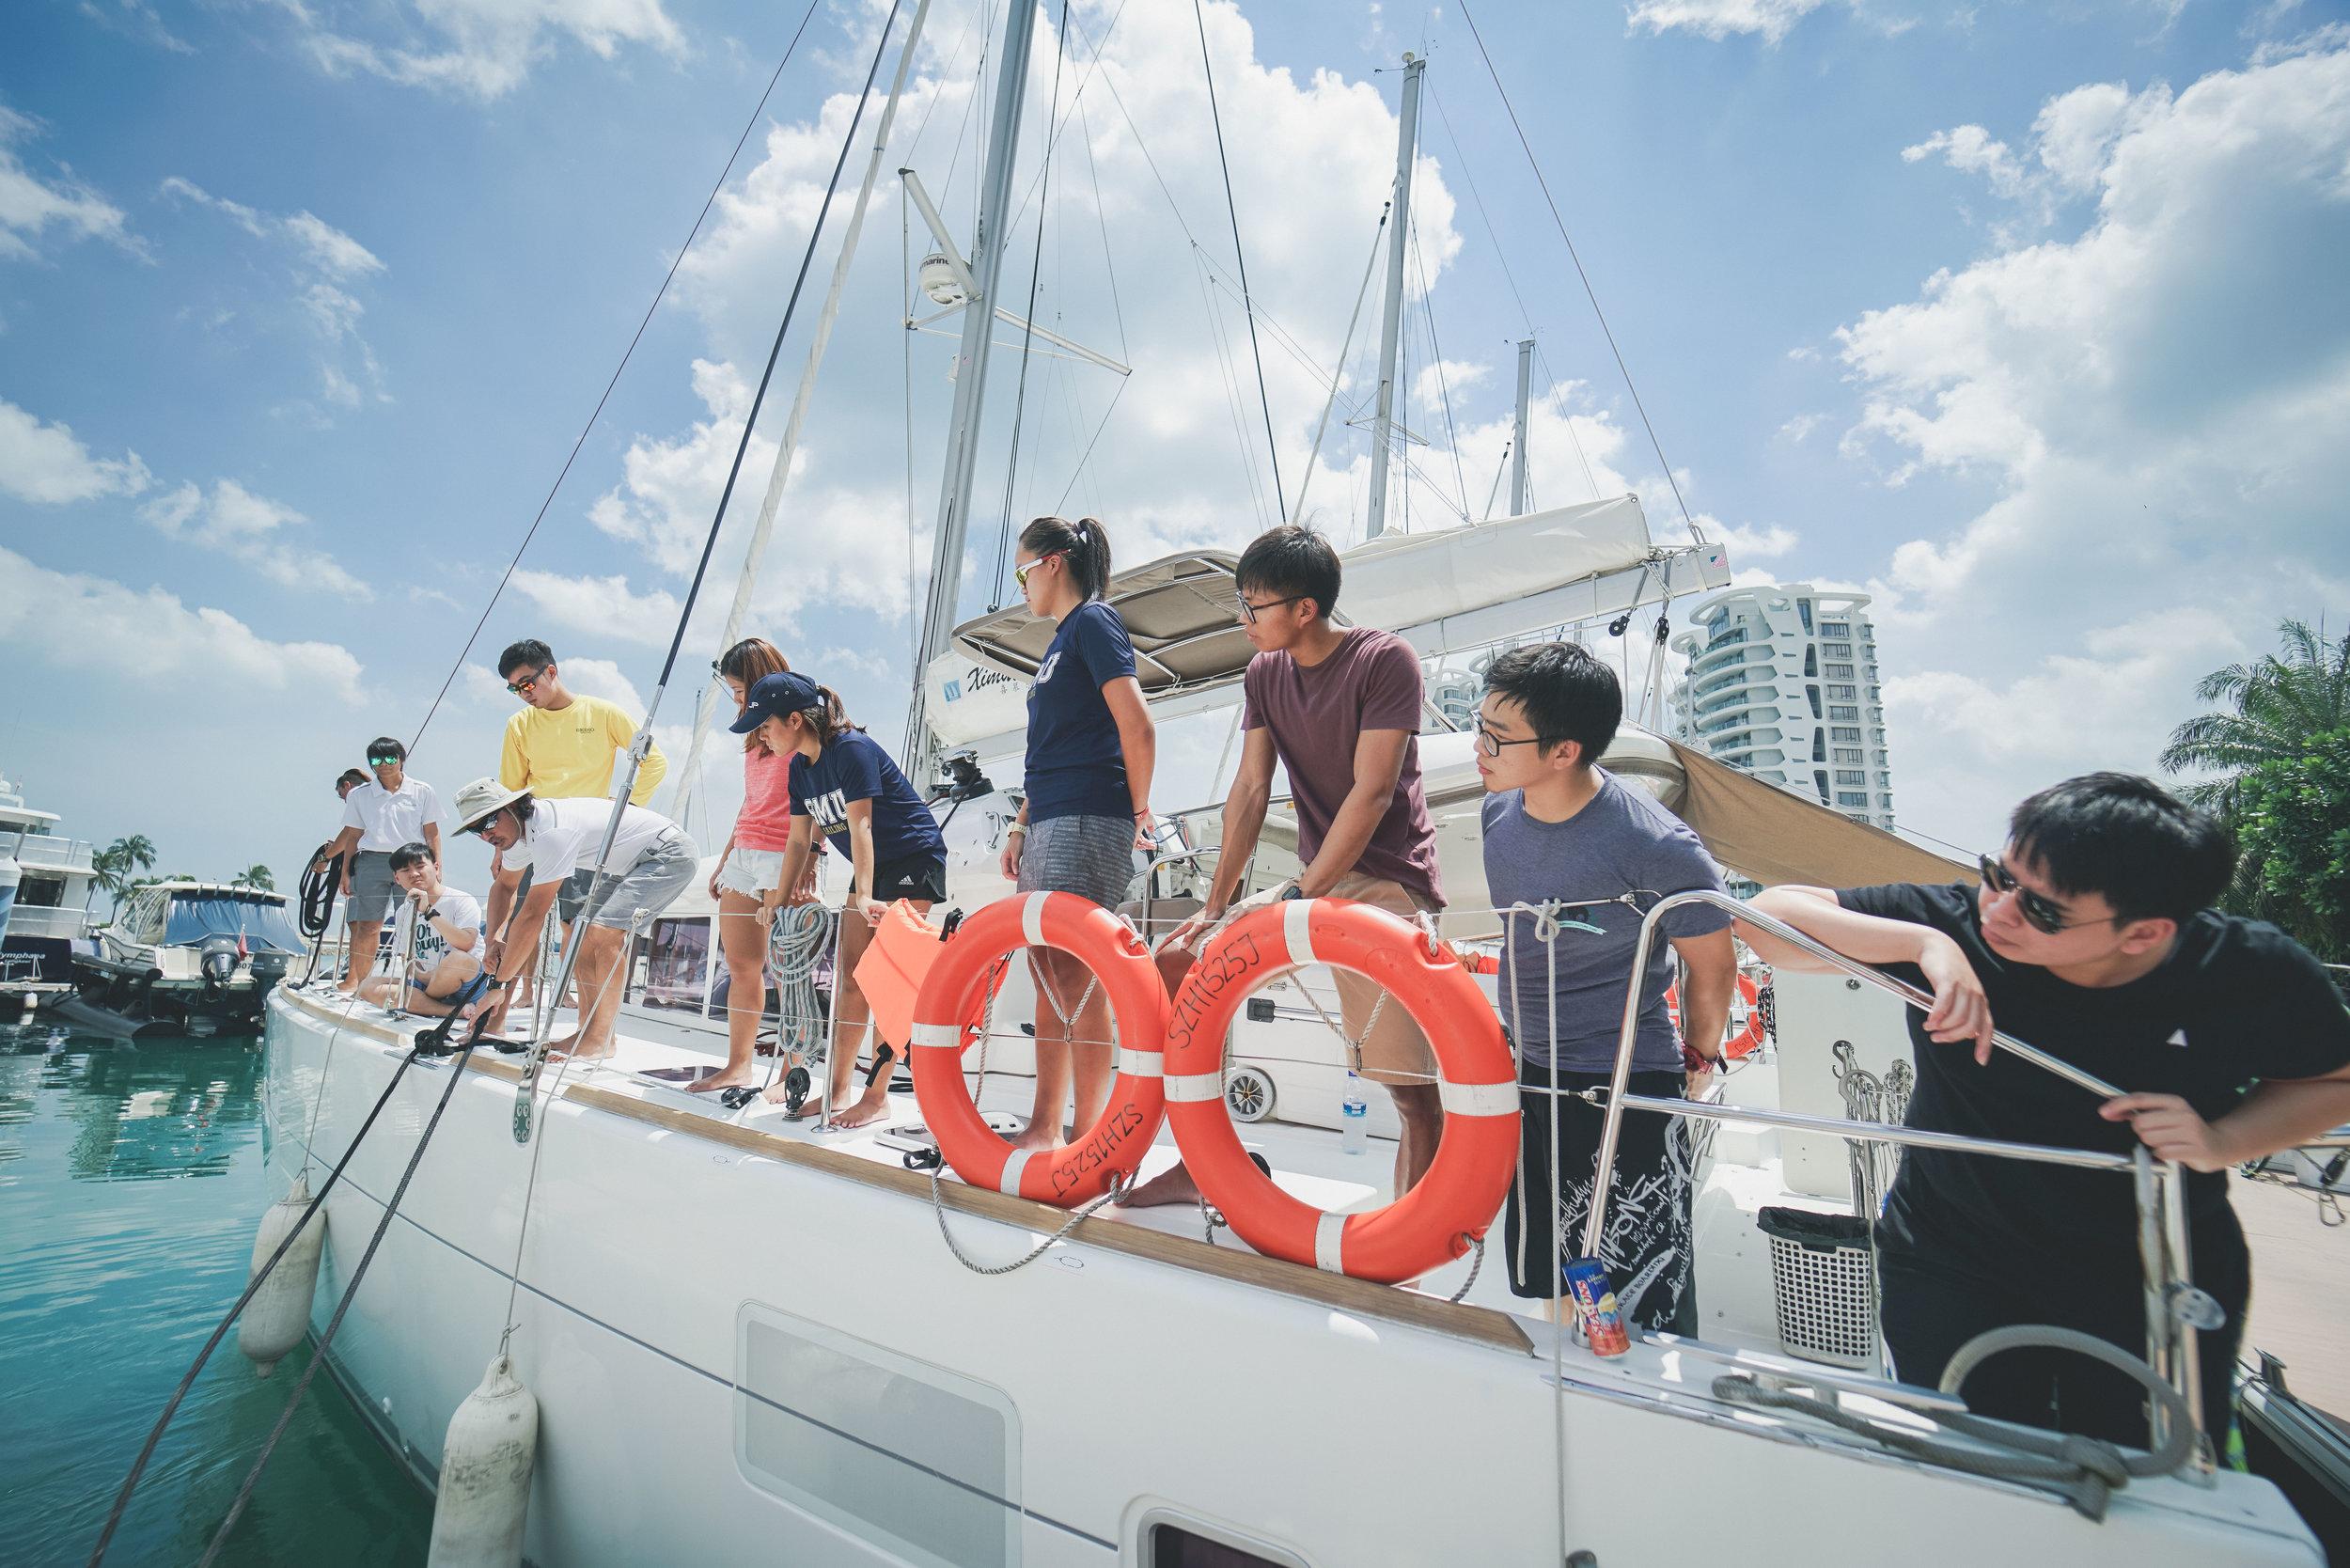 Ximula experiential sailing-1009.jpg